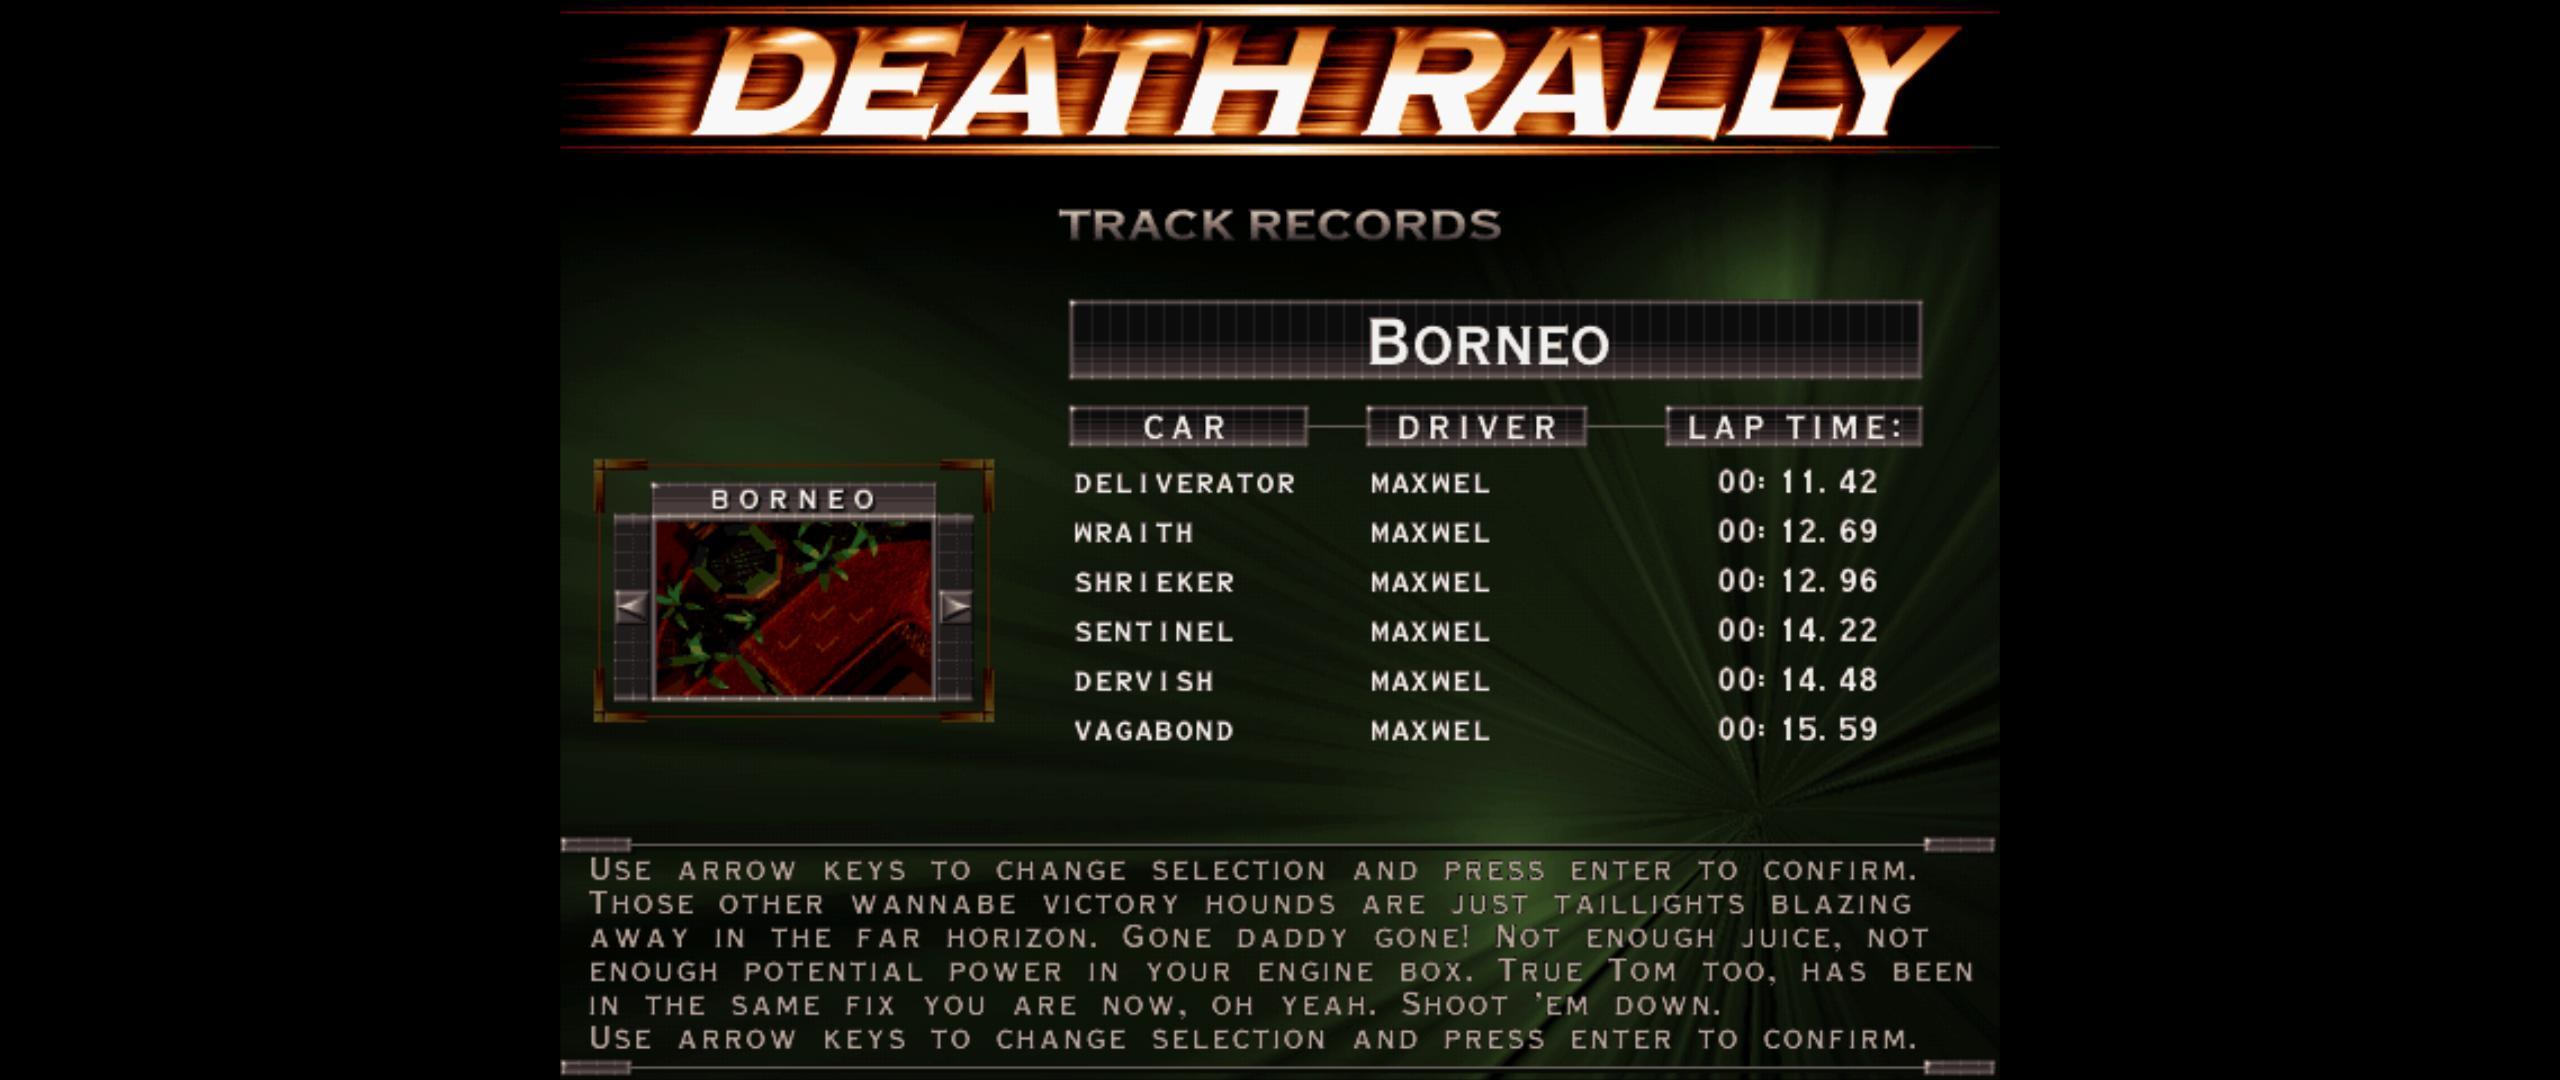 Maxwel: Death Rally [Borneo, Sentinel Car] (PC) 0:00:14.22 points on 2016-03-04 07:54:39